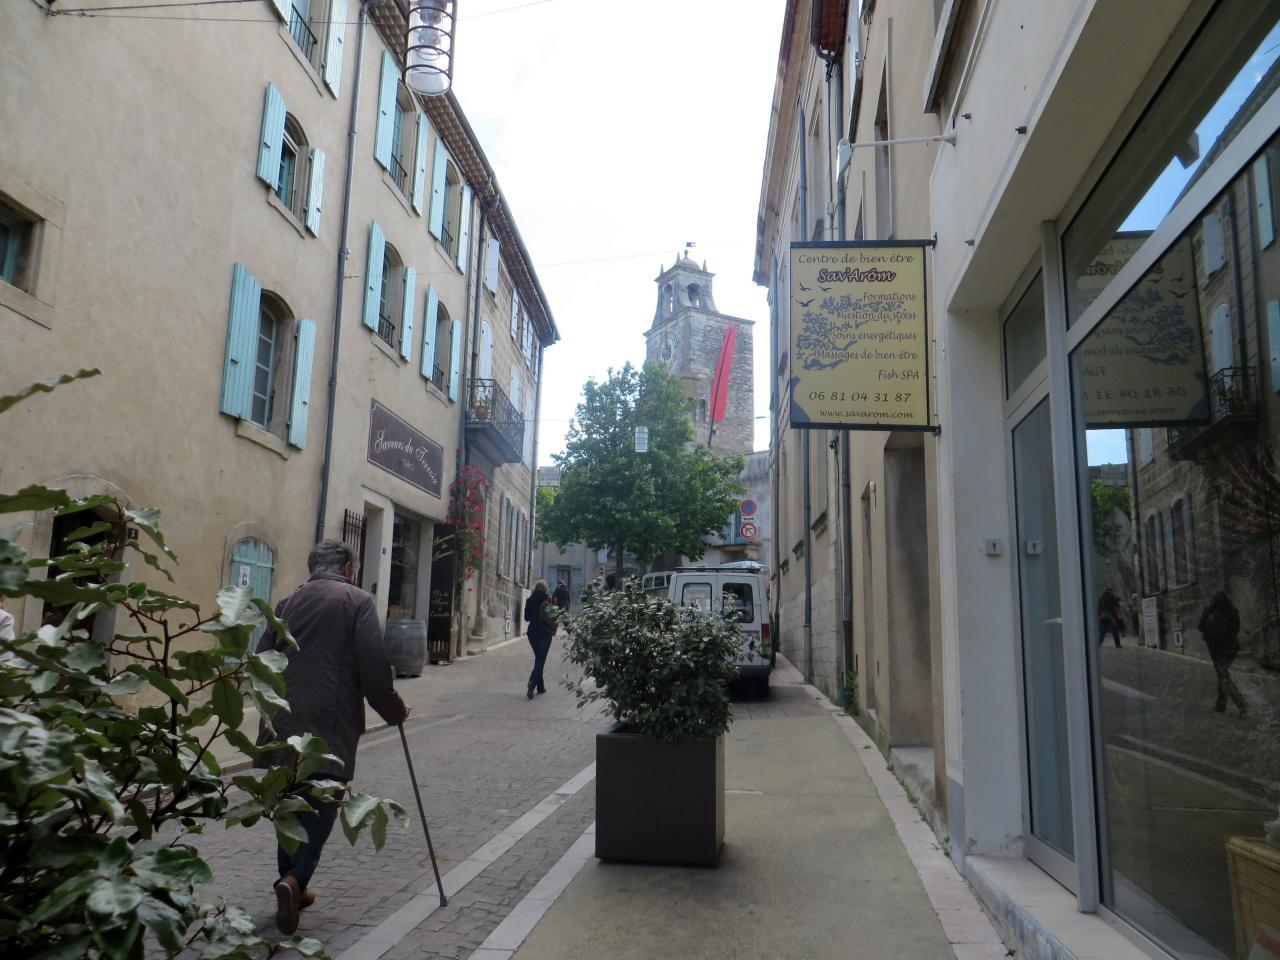 Grignan (2)